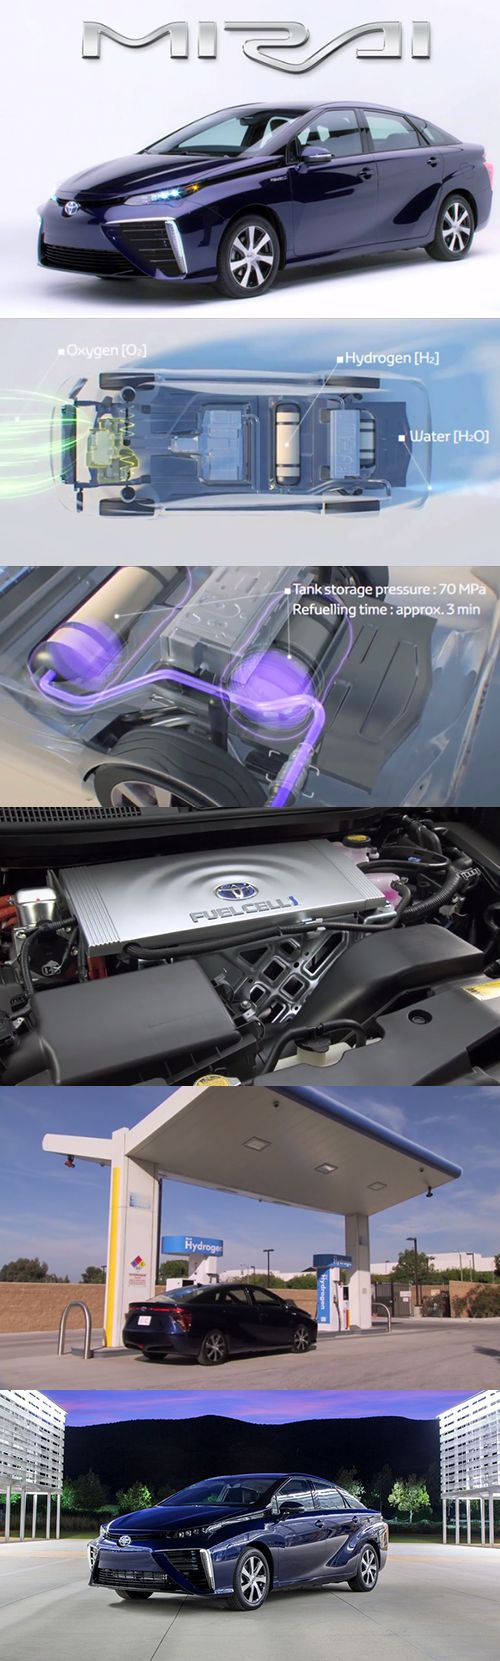 Toyota's hydrogen fuel cell car, Mirai.